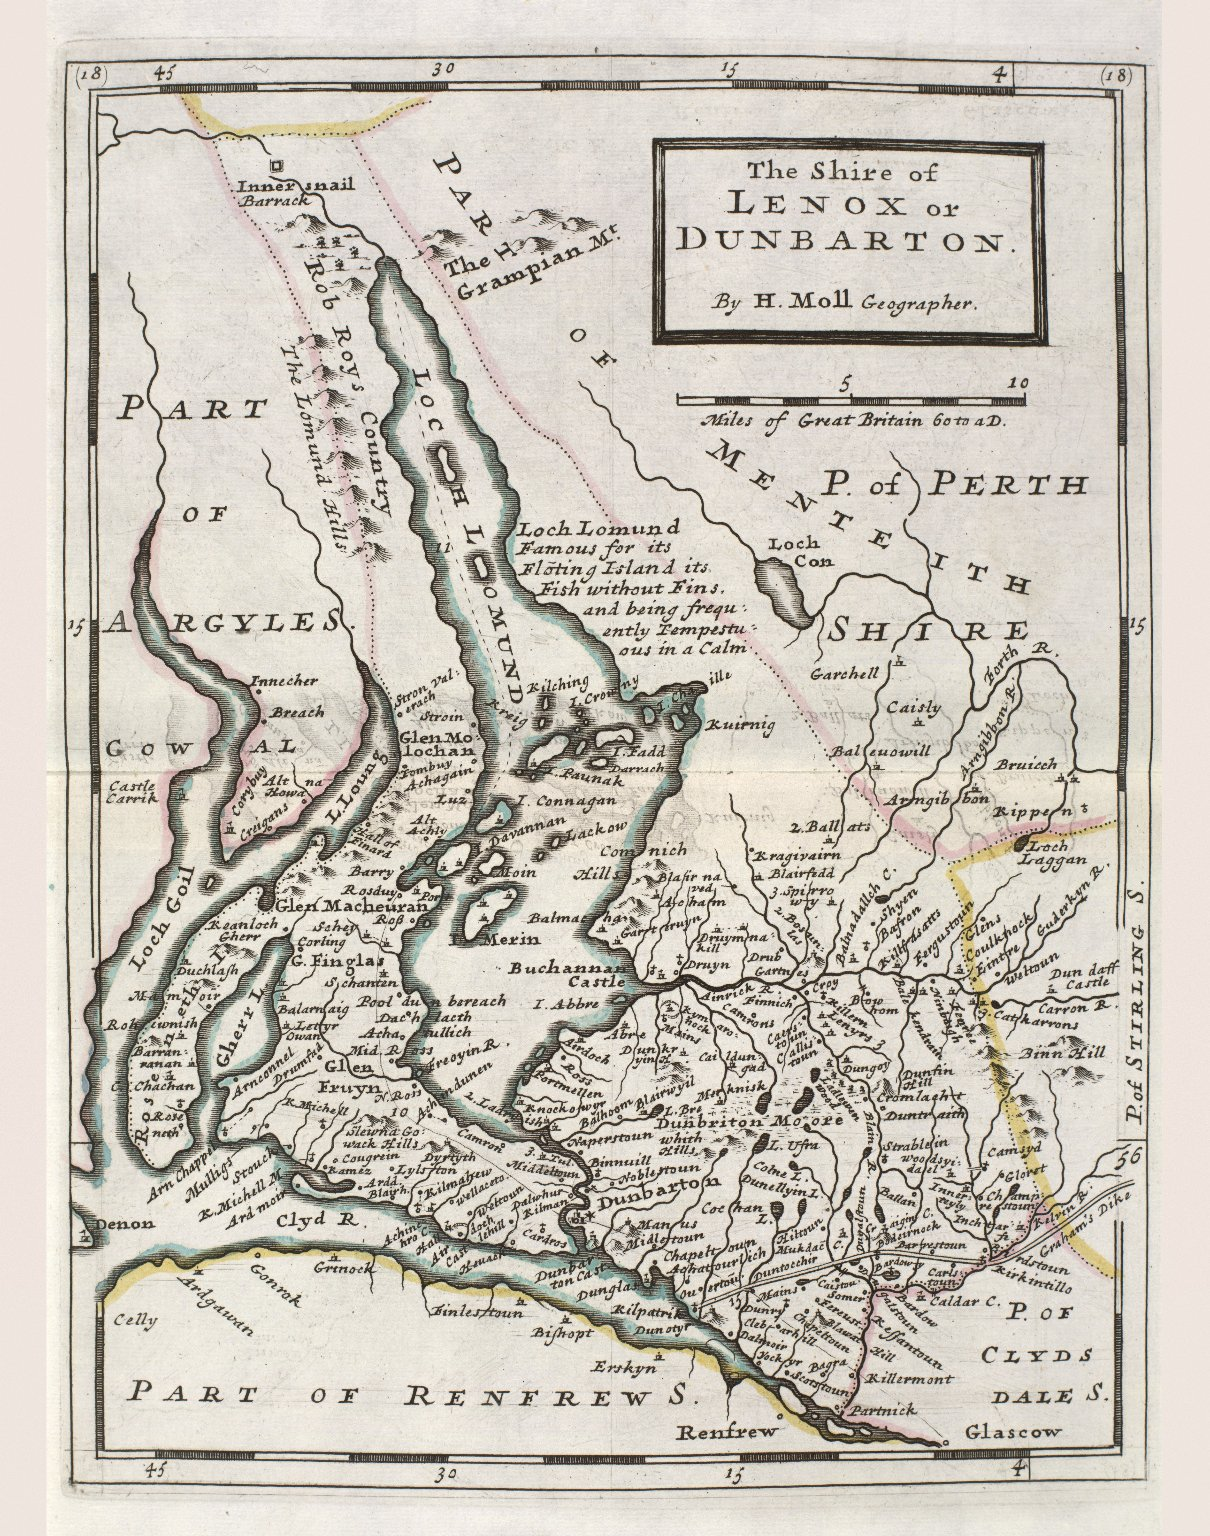 The Shire of Lenox or Dunbarton. [1 of 1]